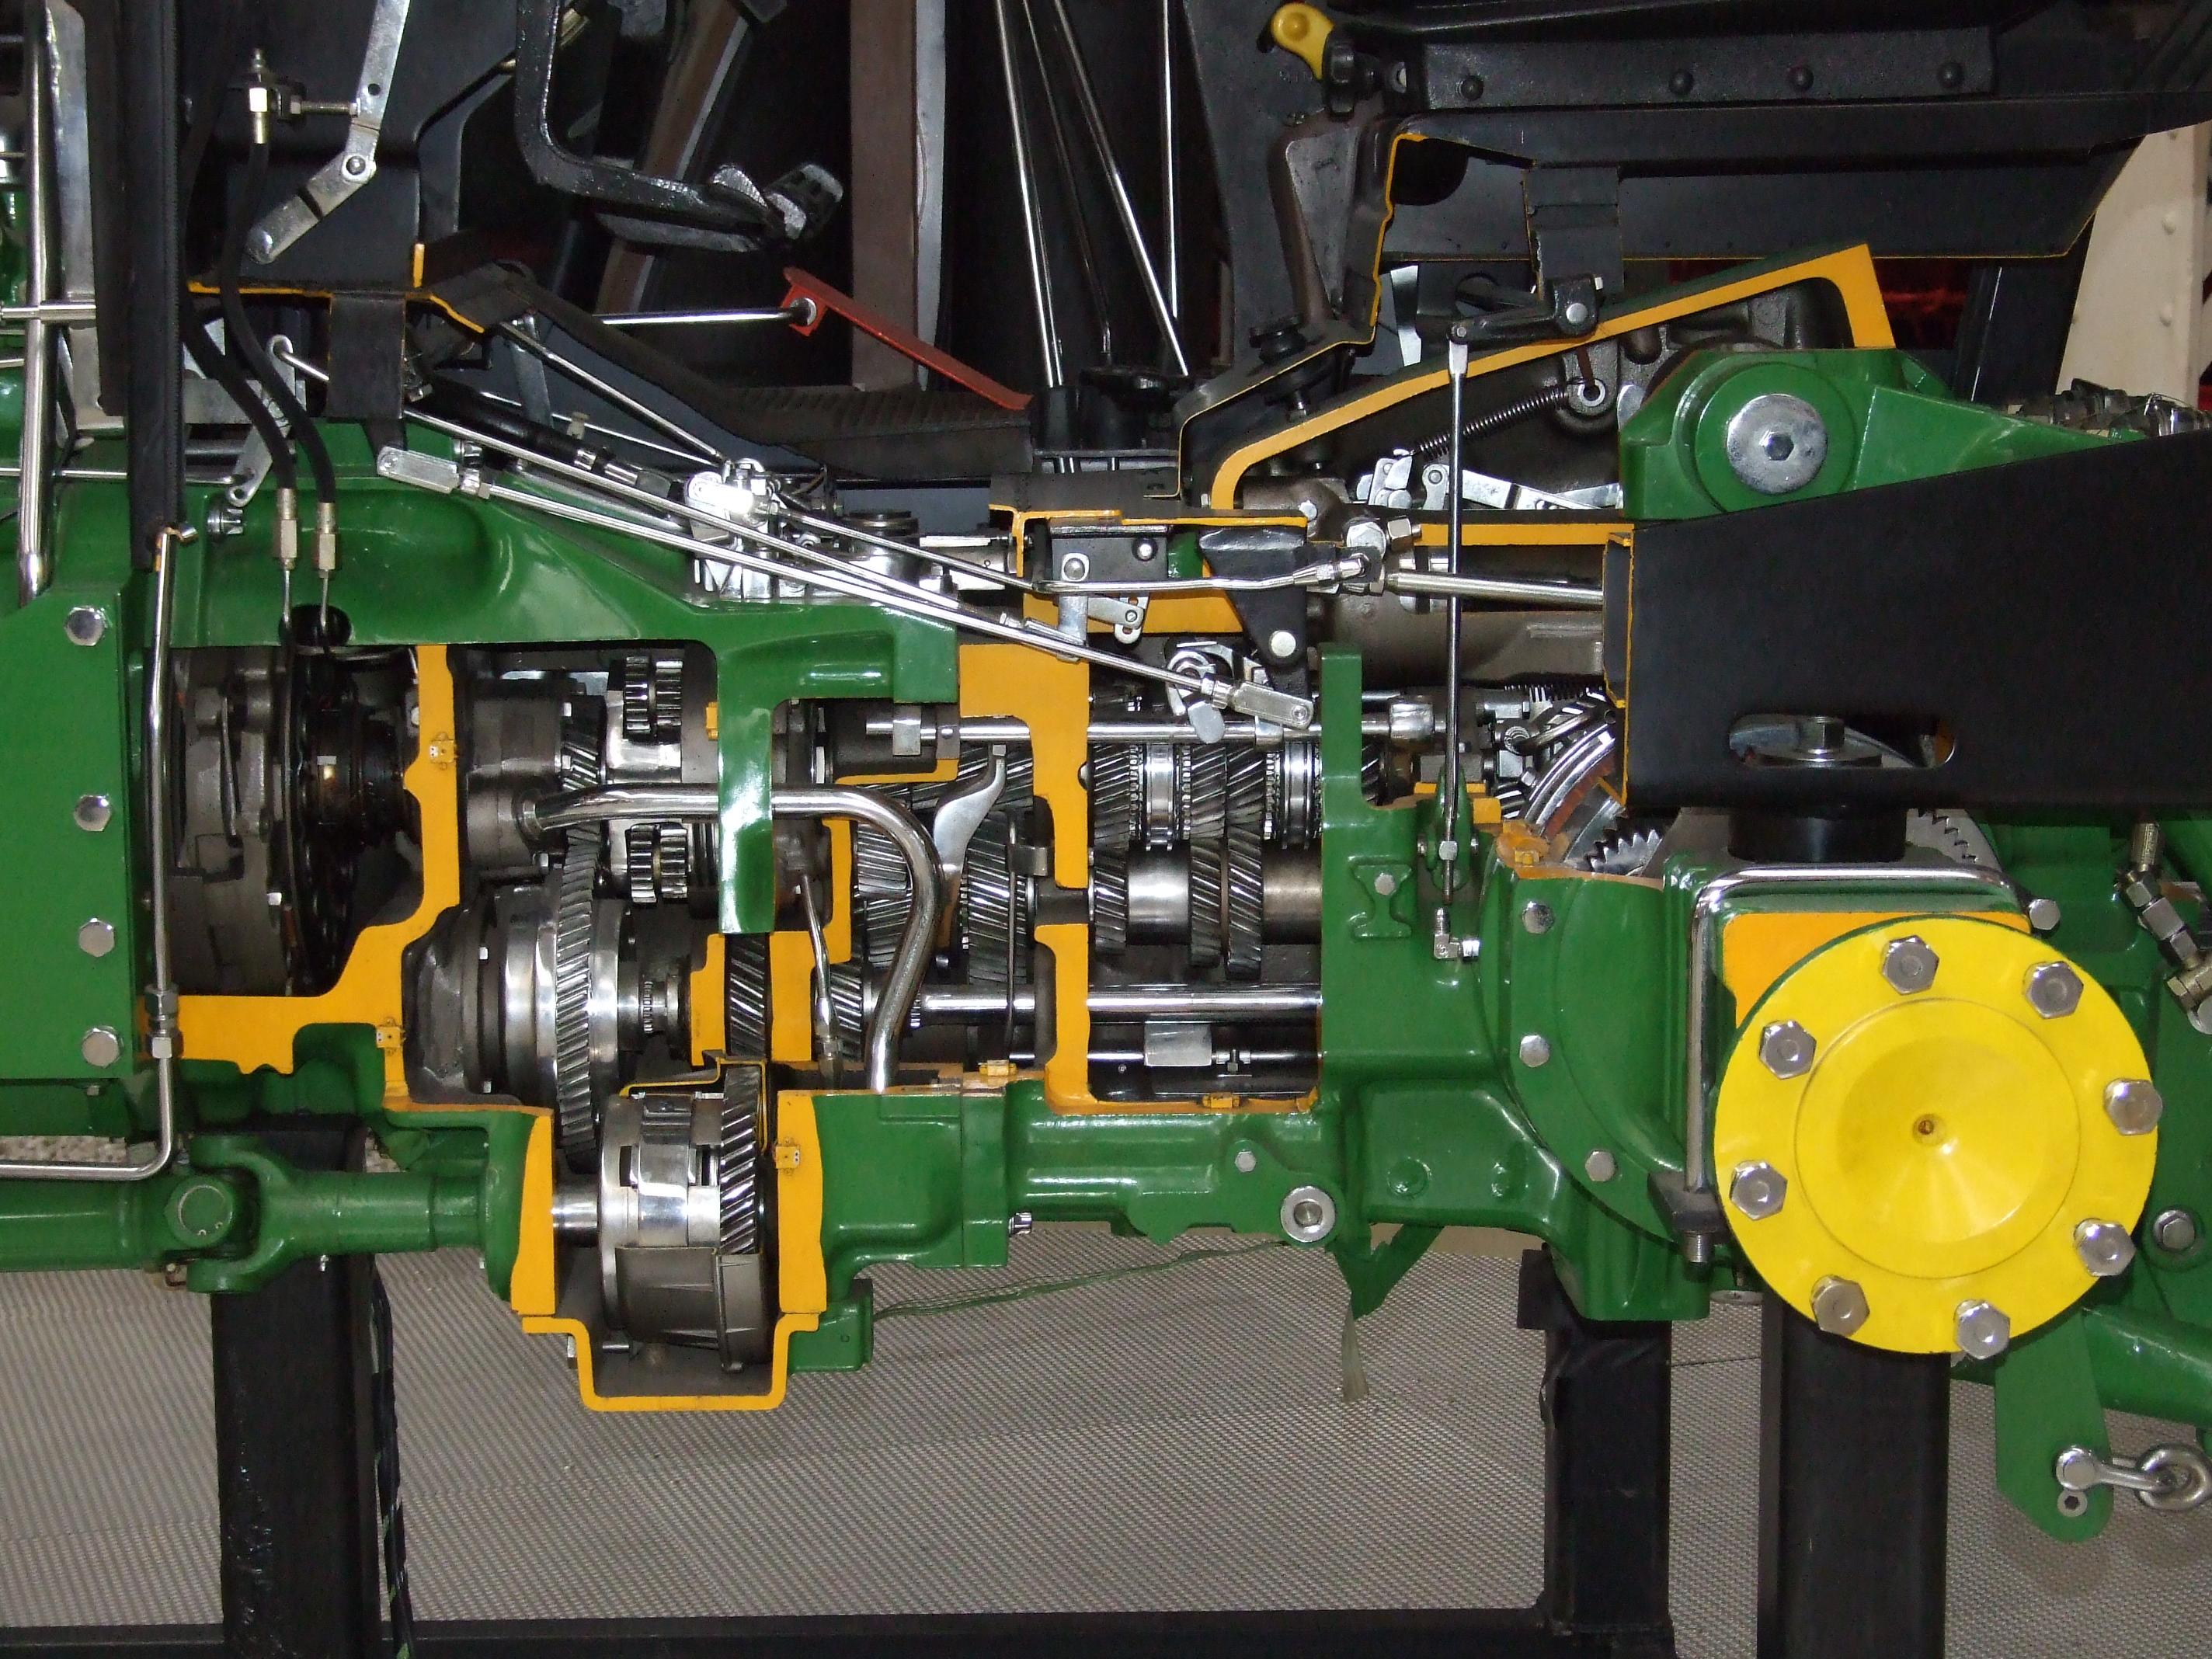 John Deere Transmission System S670 Wiring Harness Filejohn 3350 Tractor Cut Wikipedia